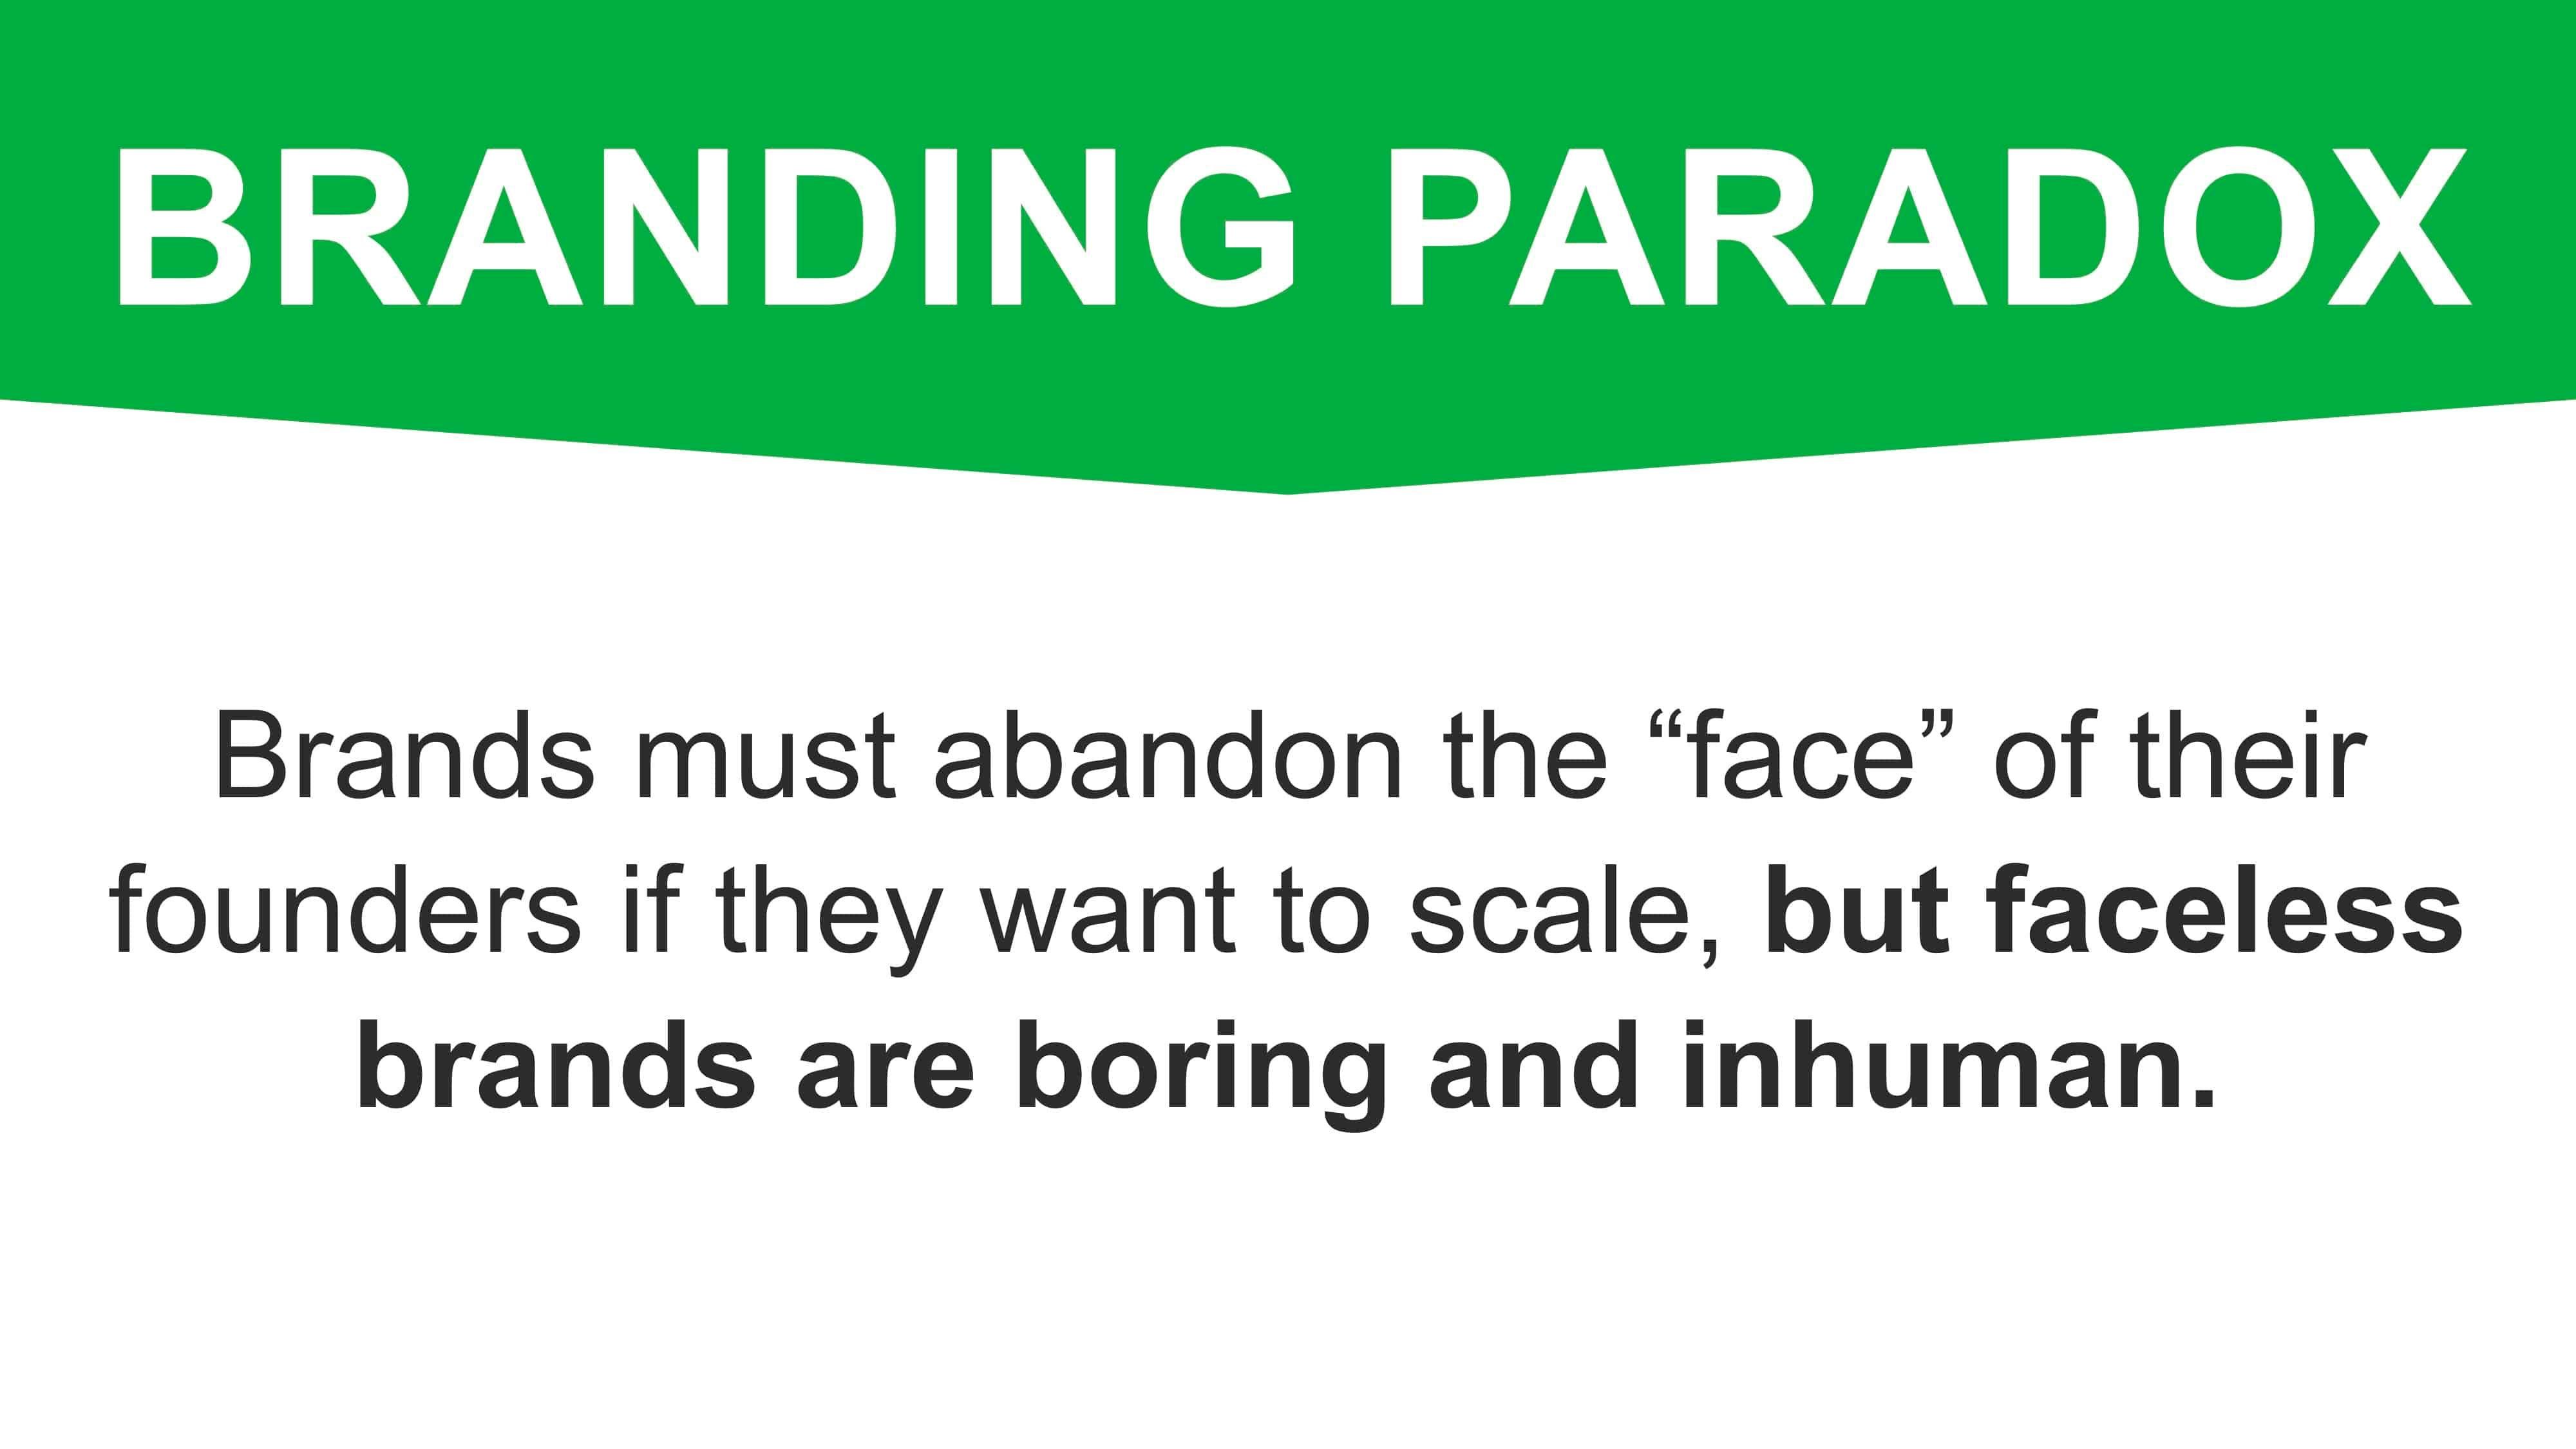 Brand Paradox